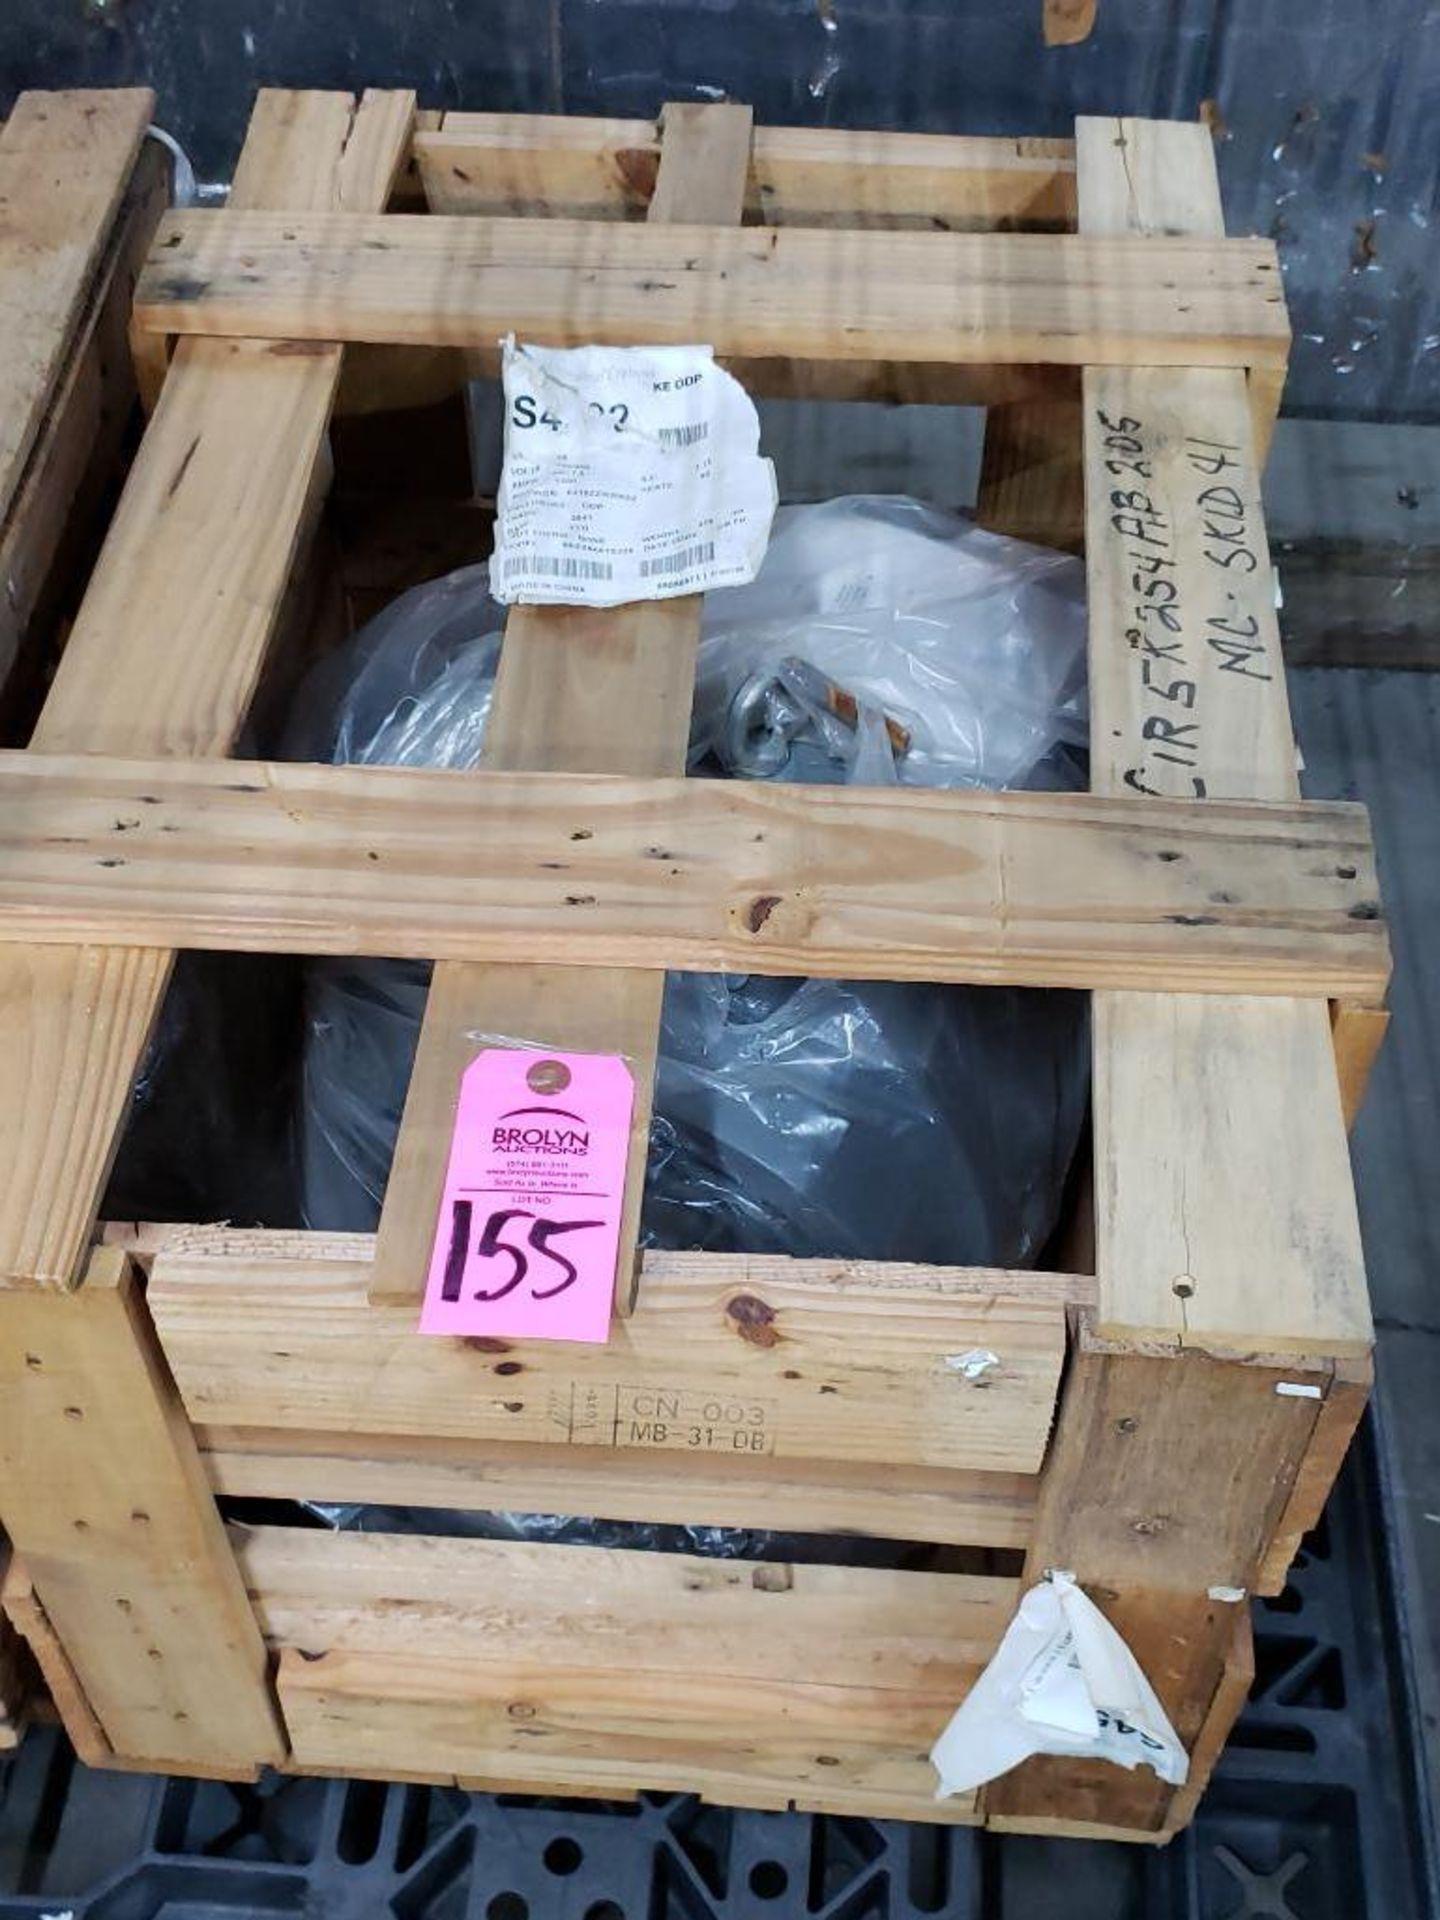 Lot 155 - 15hp GE motor model 5KE254ATE205, 3 phase 230/460v, 1800rpm, 254T frame. New in crate.